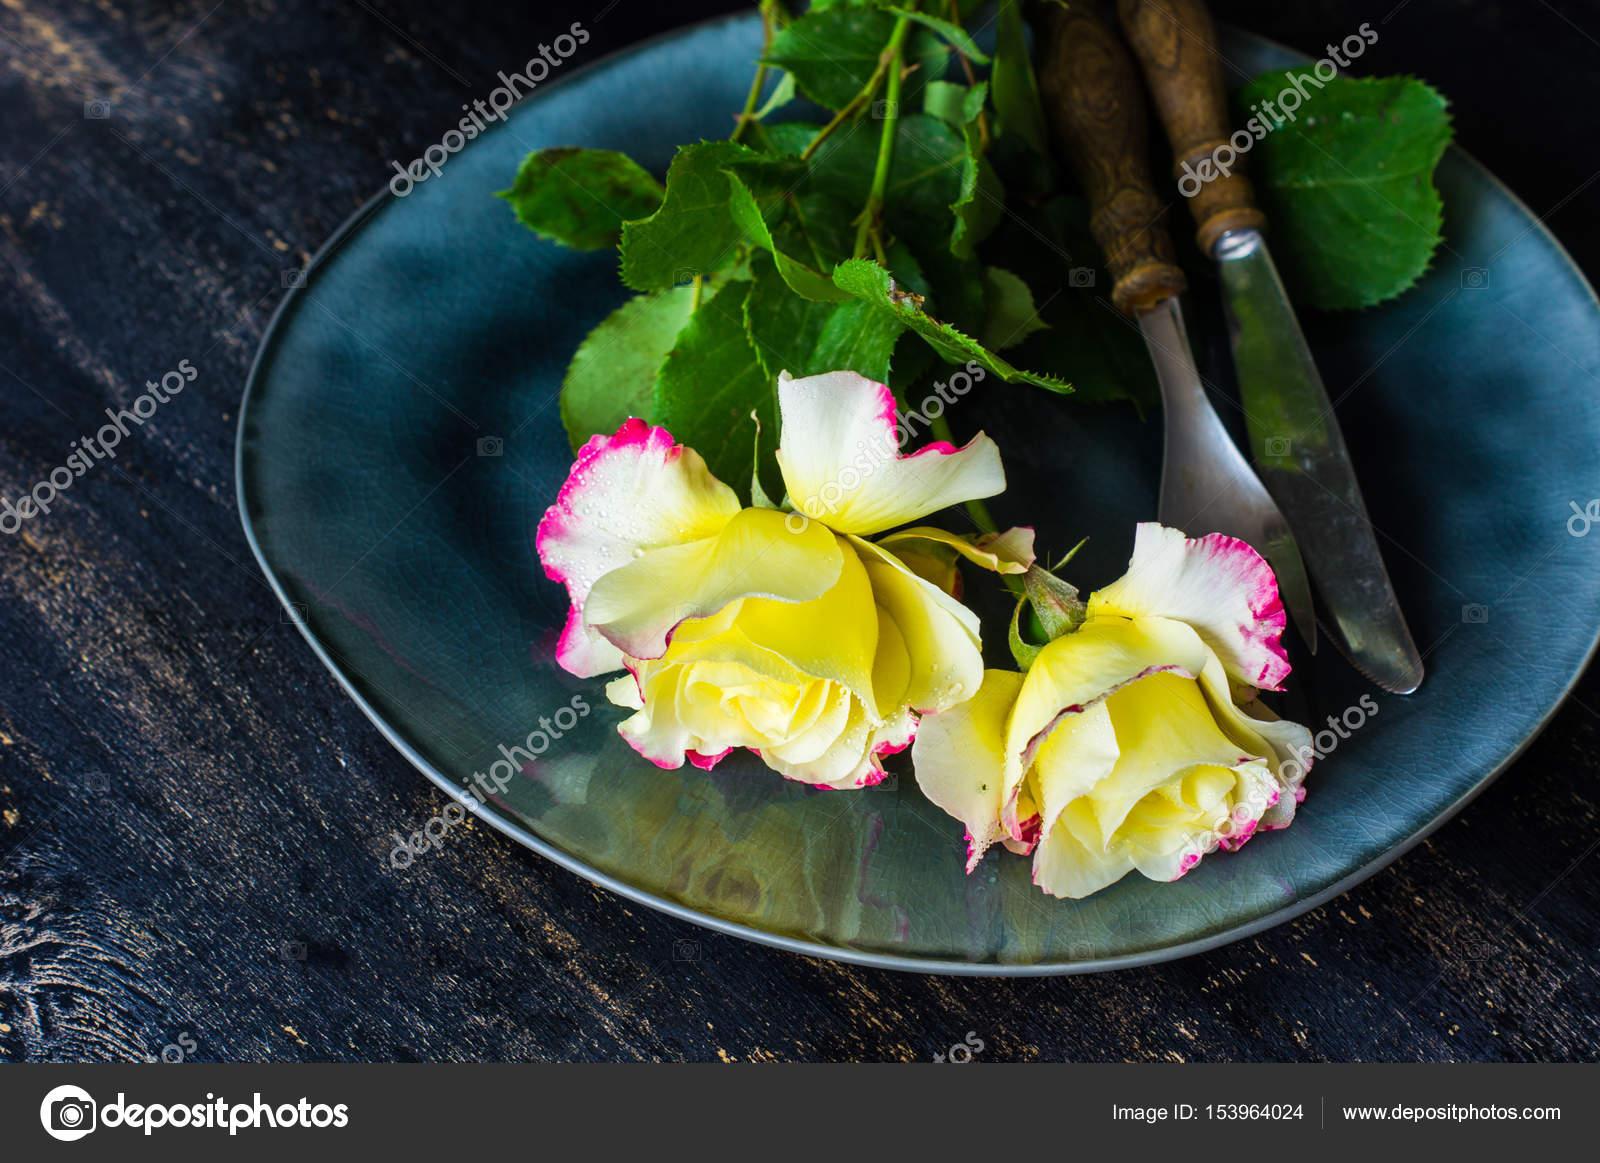 Sommer tischdekoration mit rosen stockfoto elet 1 153964024 - Tischdekoration mit rosen ...